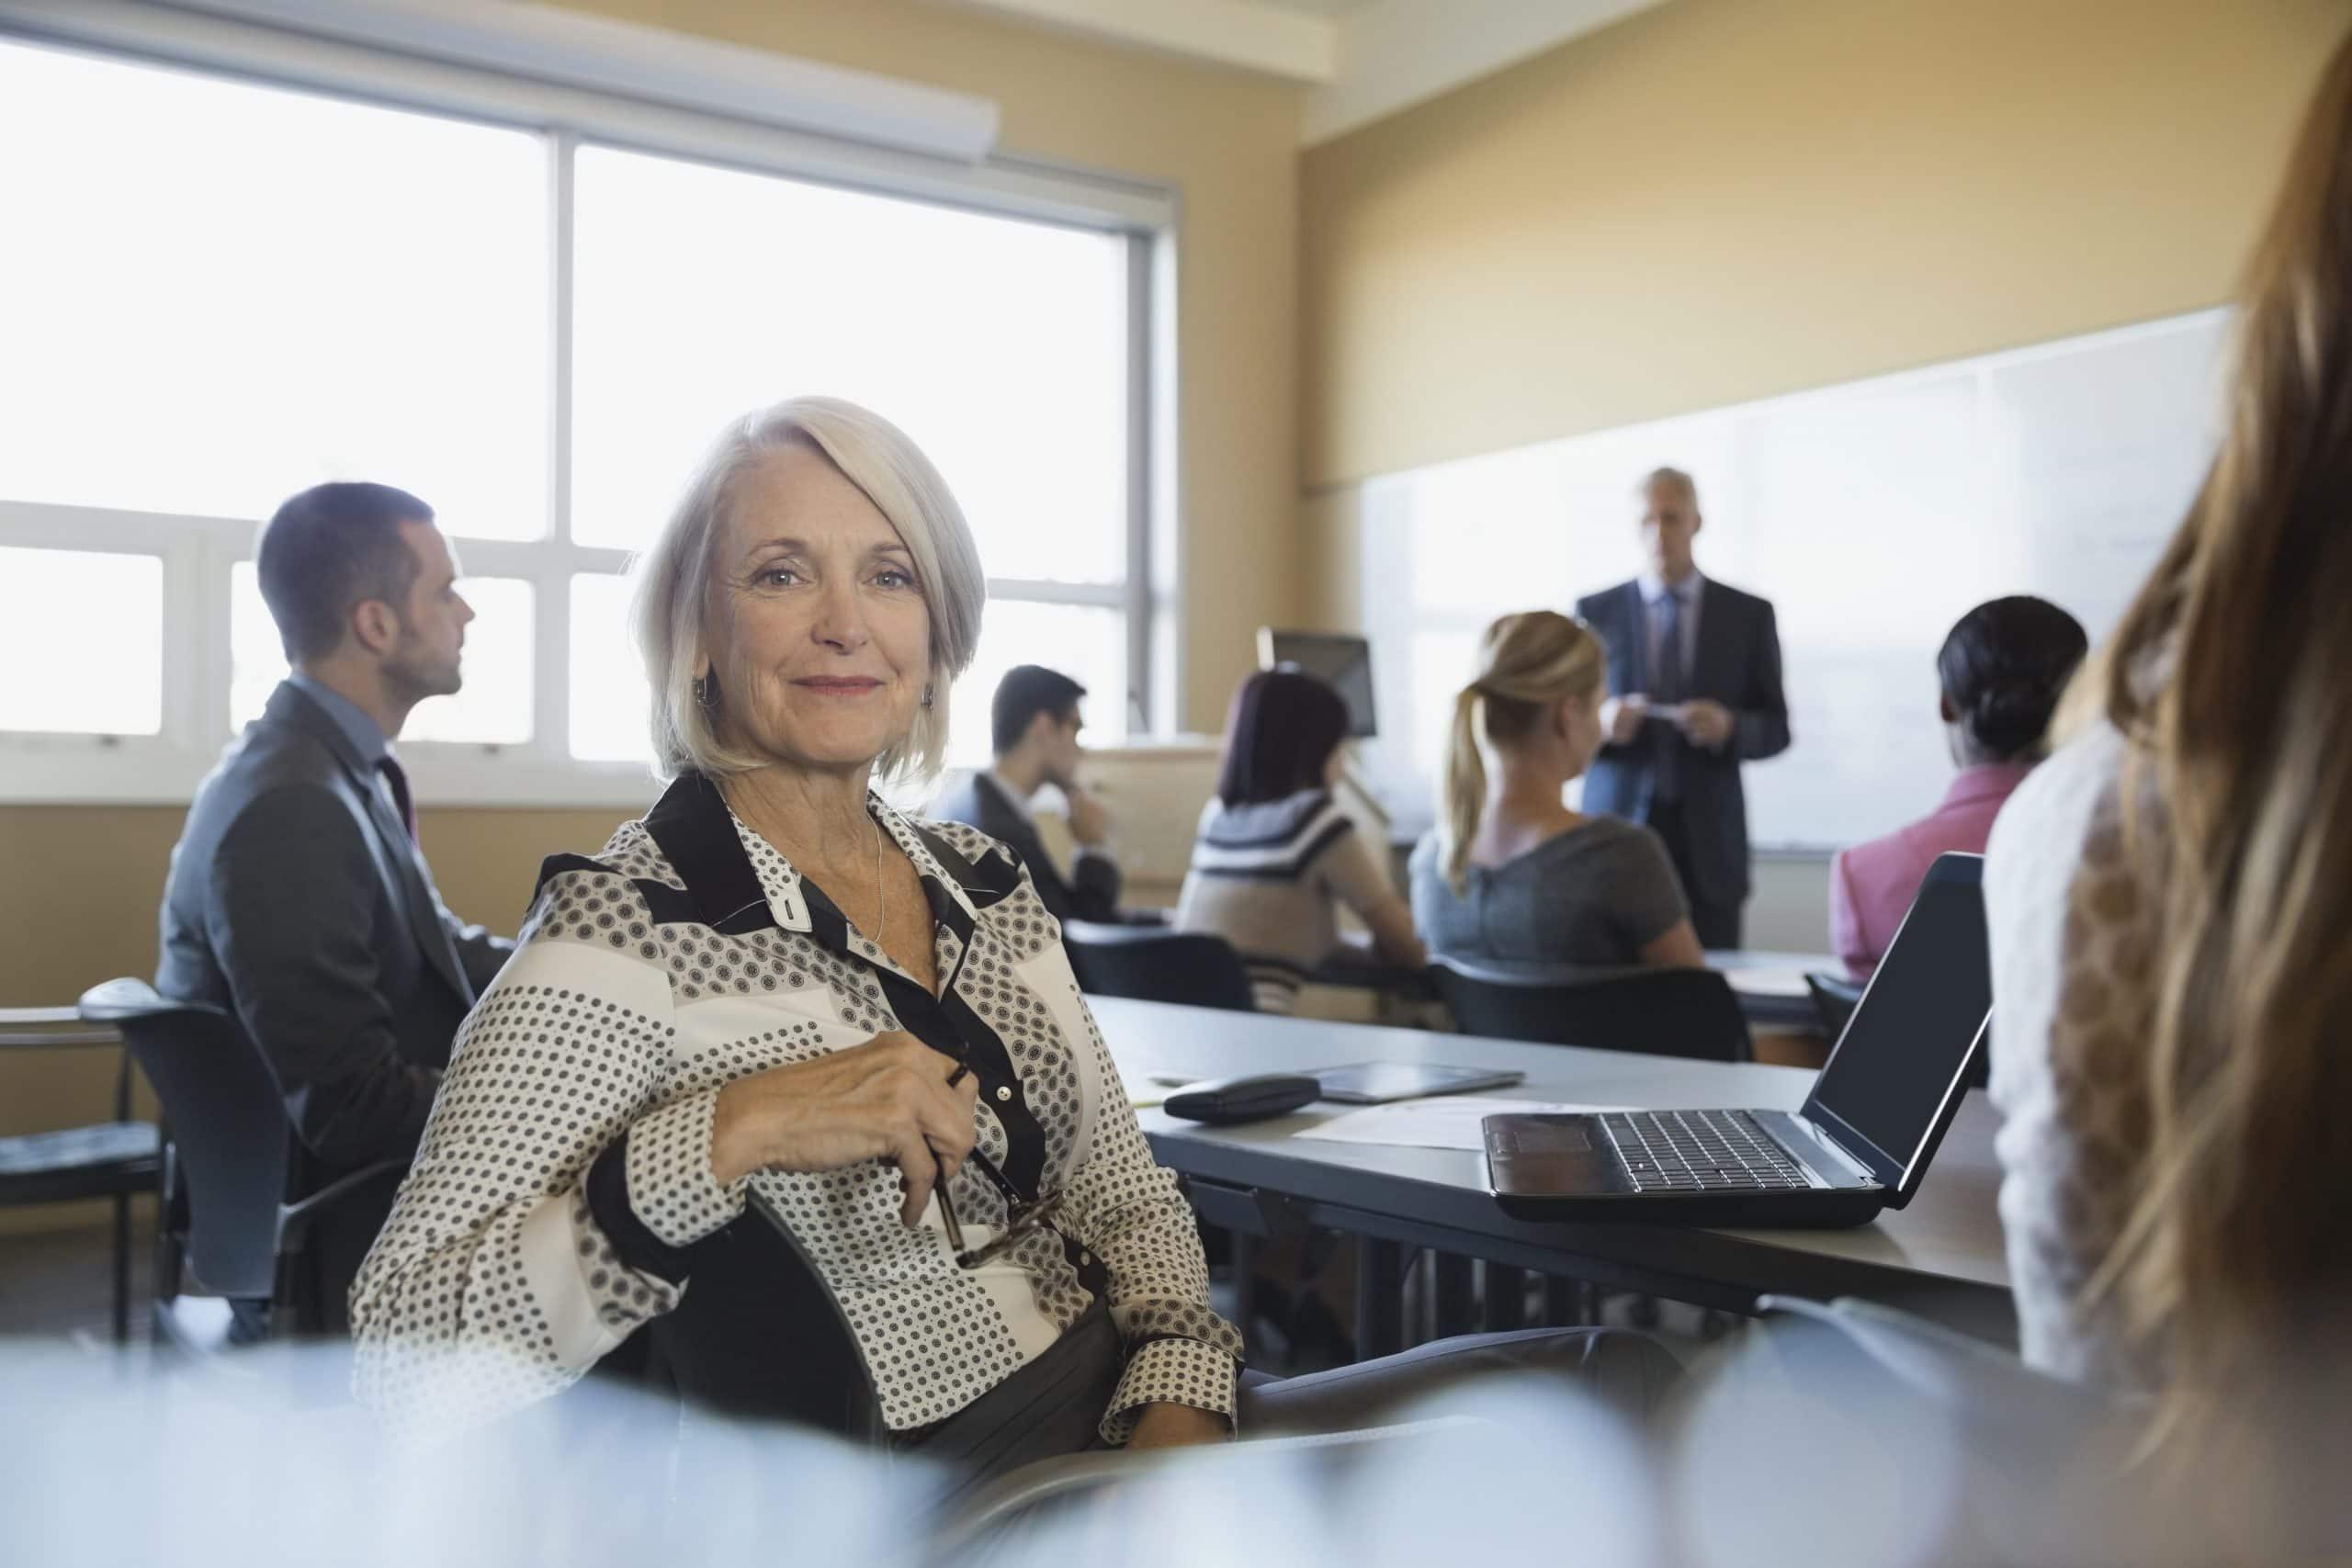 Portrait of confident businesswoman in training class